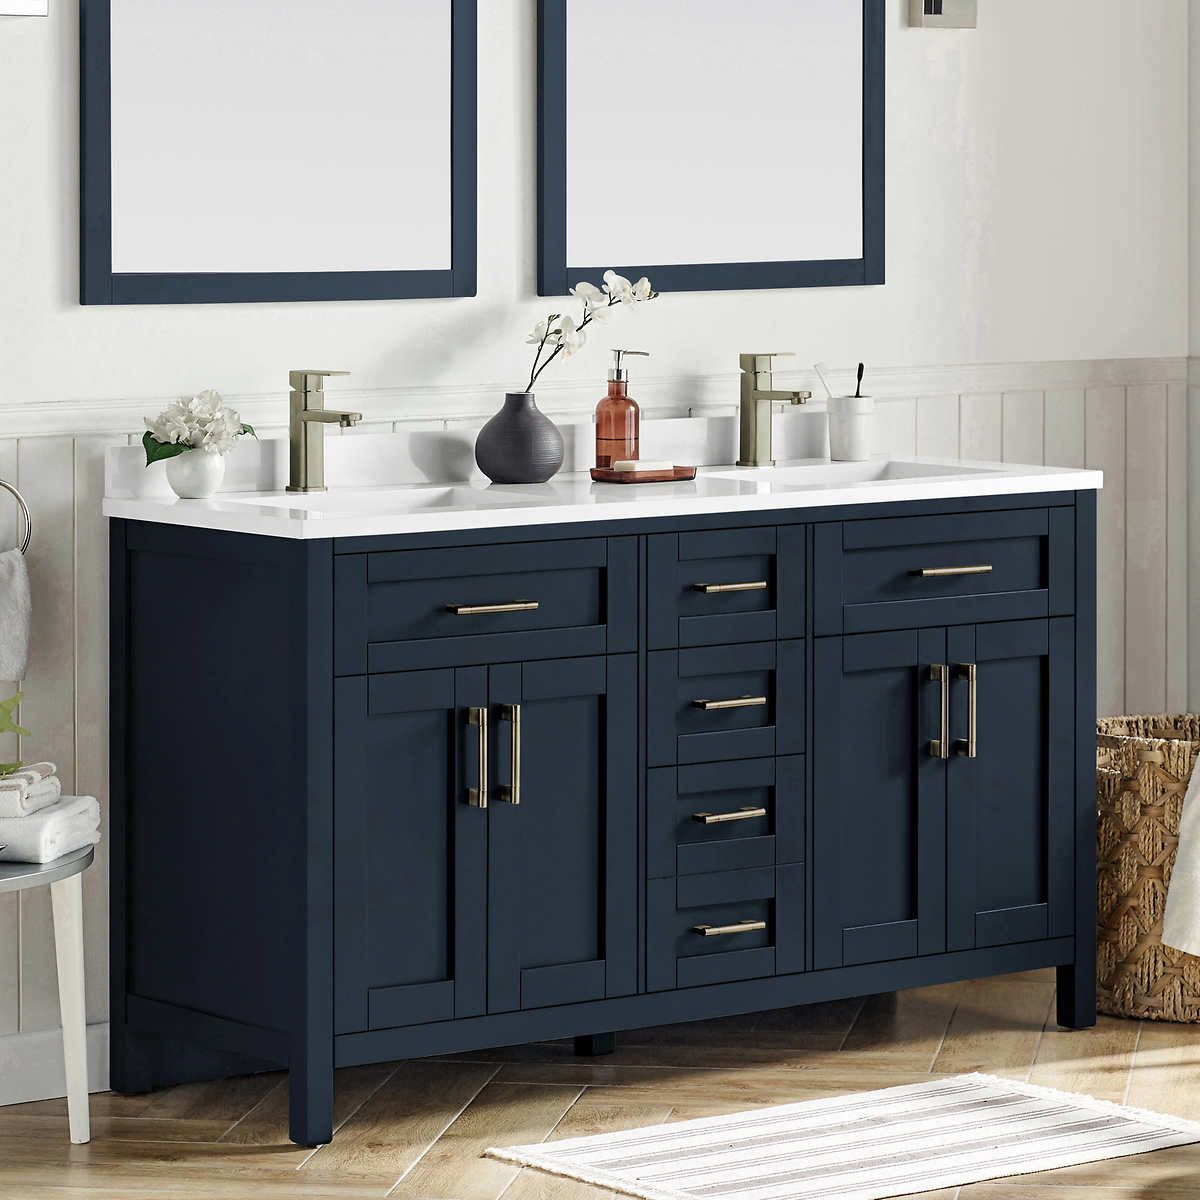 Lakeview 60 Vanity By Ove In 2020 Painted Vanity Bathroom 60 Vanity Blue Bathroom Vanity